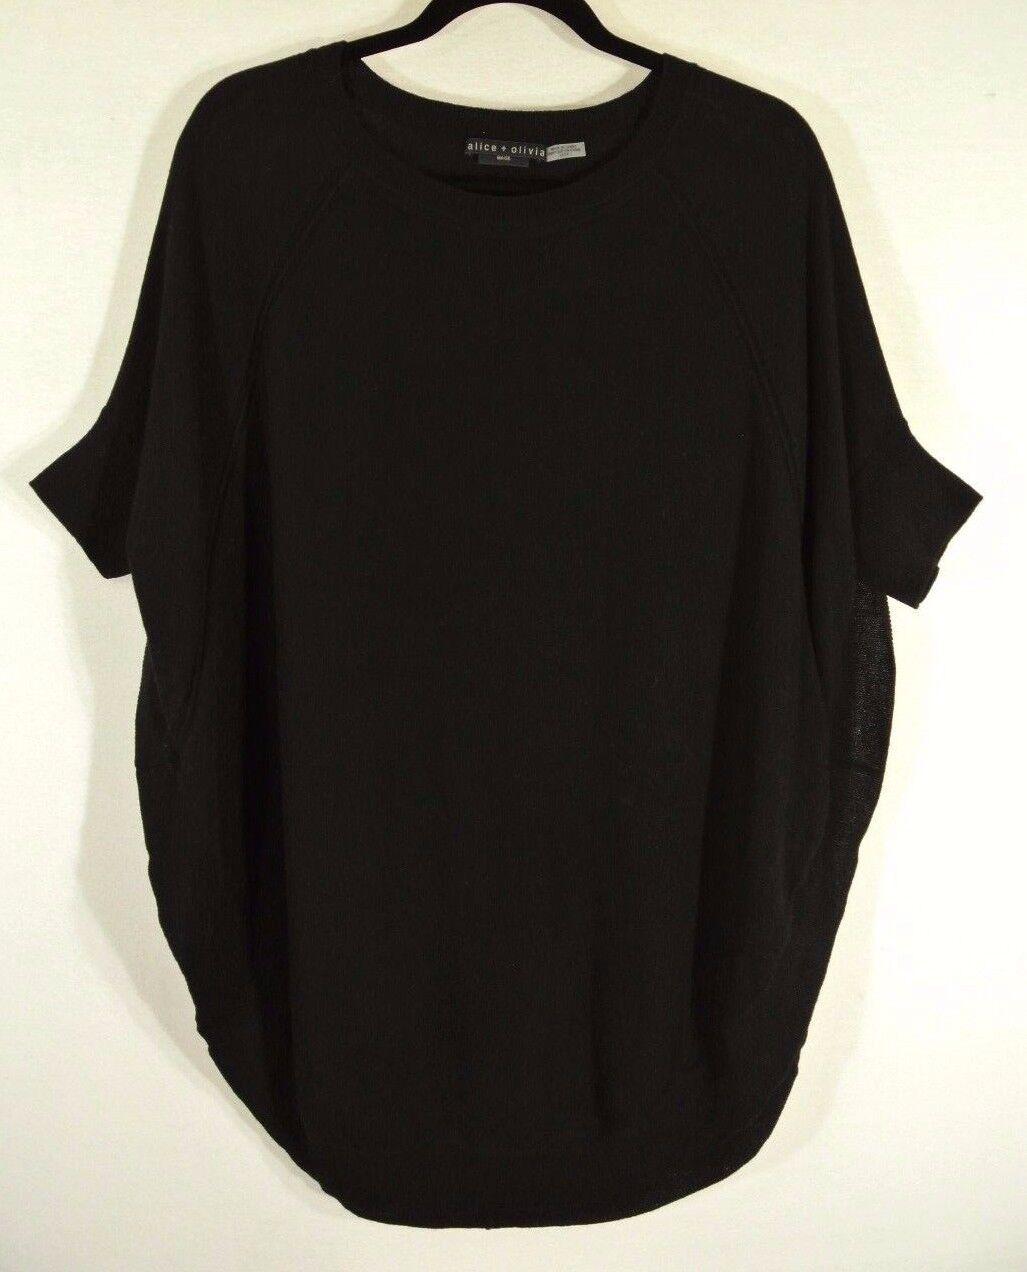 NEW ALICE+OLIVIA  three quarter sleeves jumper- schwarz XS  S537